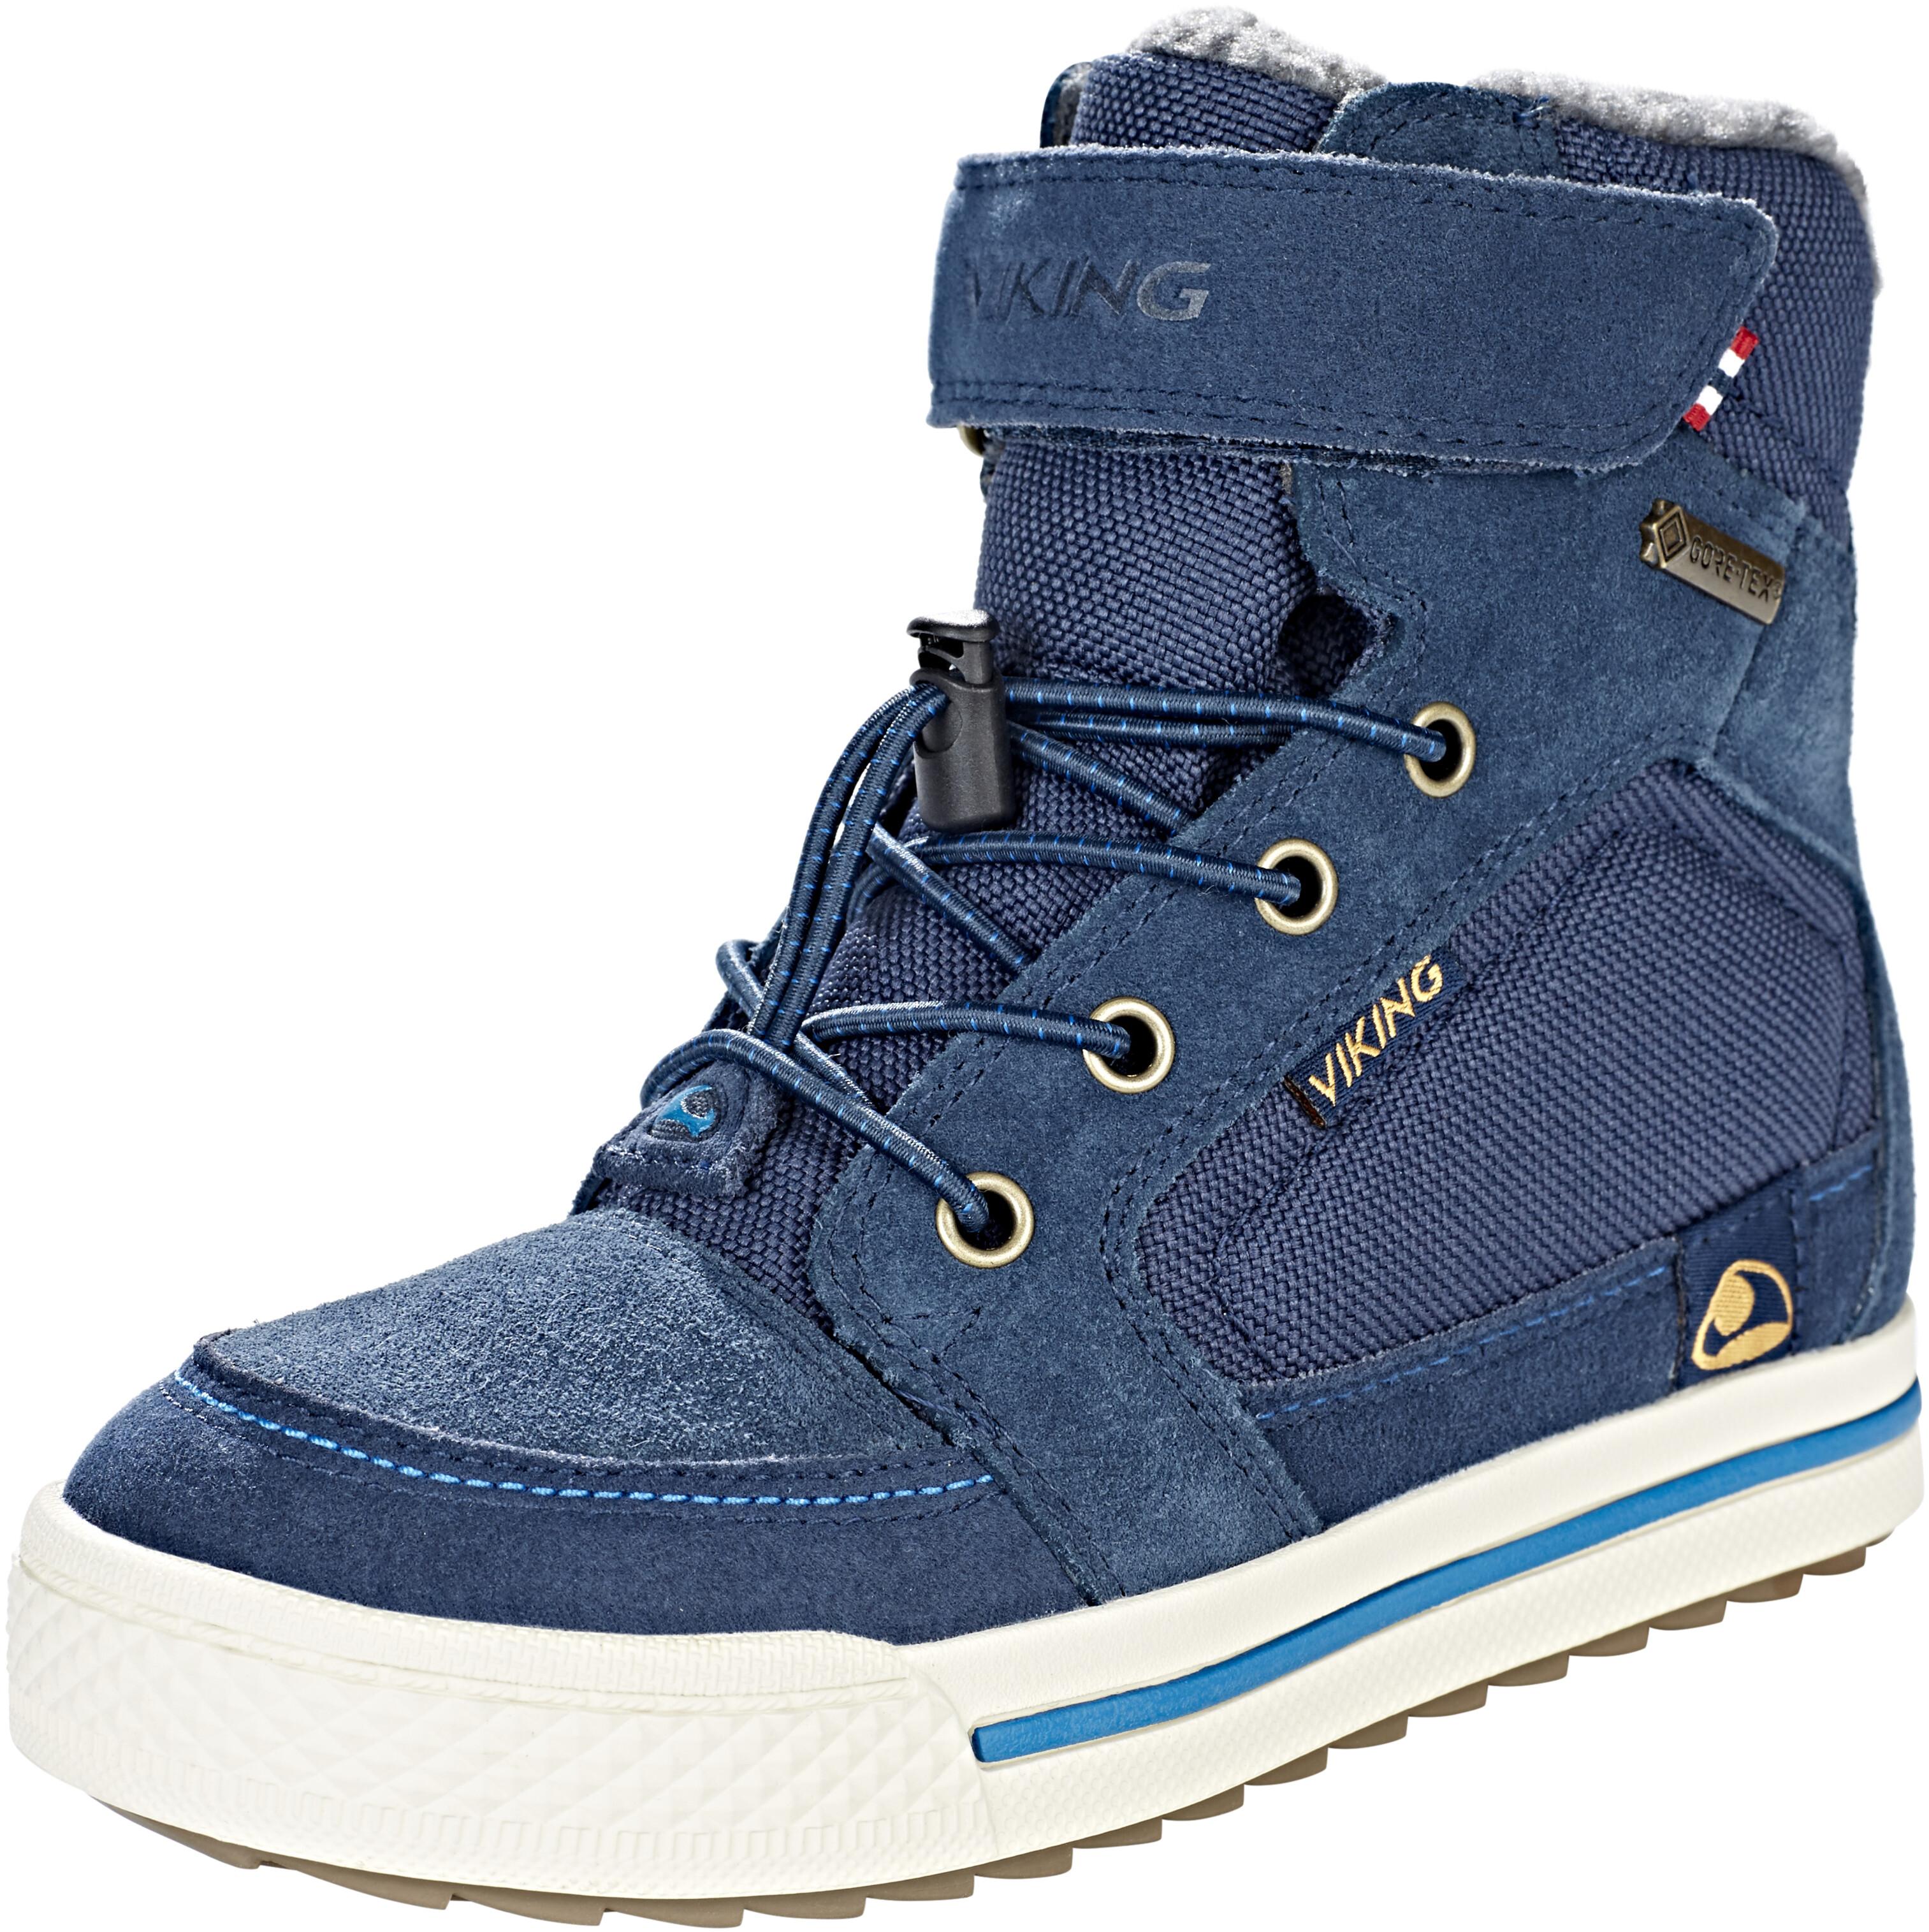 Viking Footwear Zing GTX Lapset kengät  bb5e119829